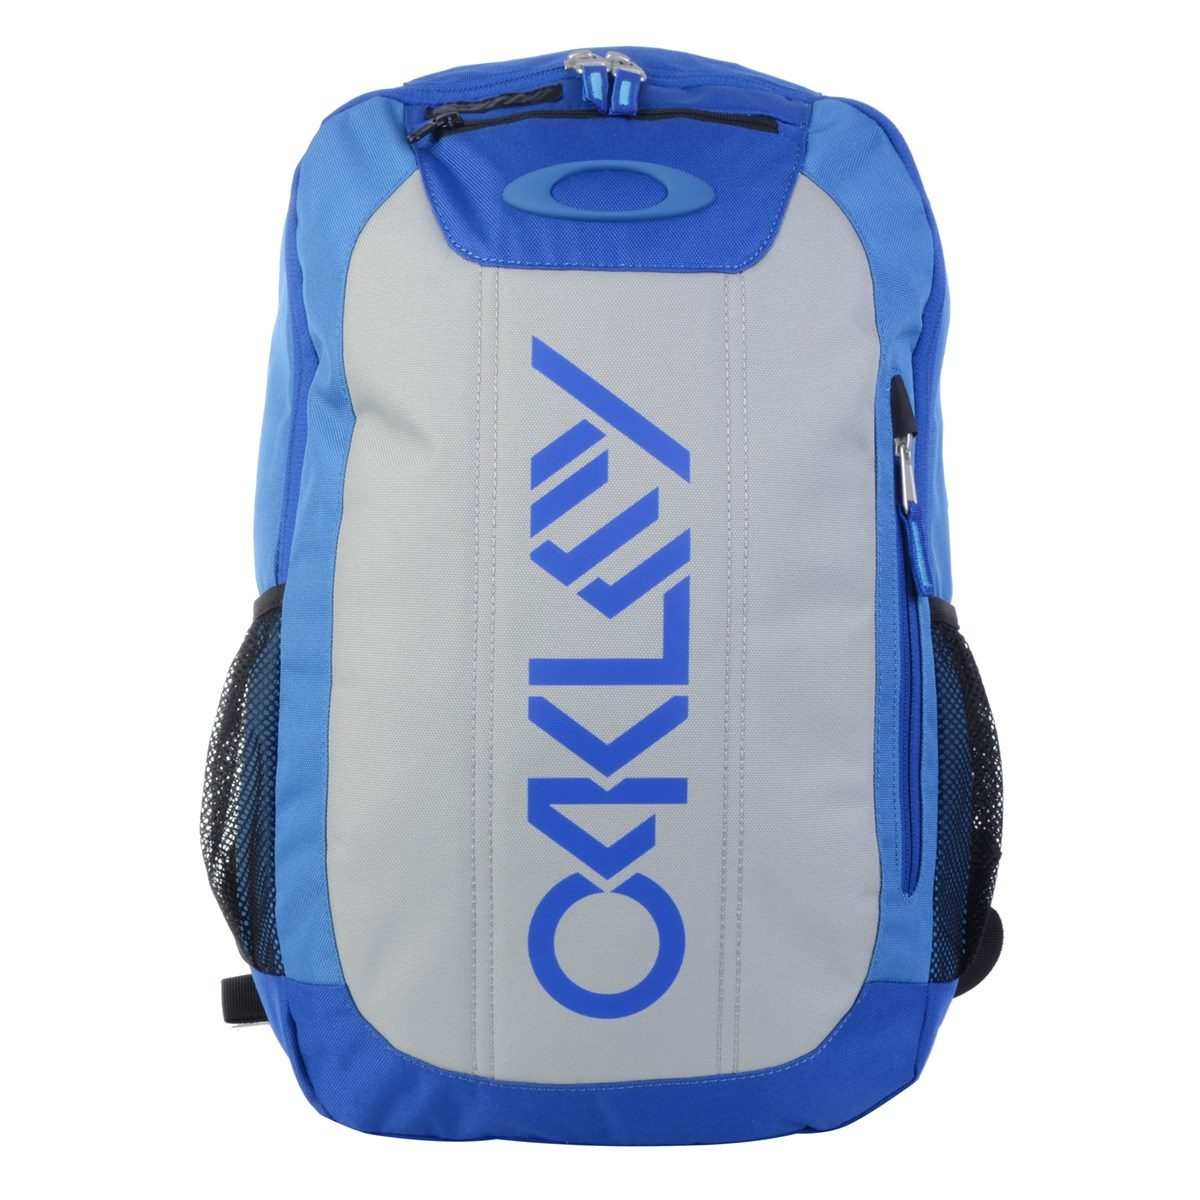 c452317d4248d mochila masculina oakley enduro 20 litros azul. Carregando zoom.